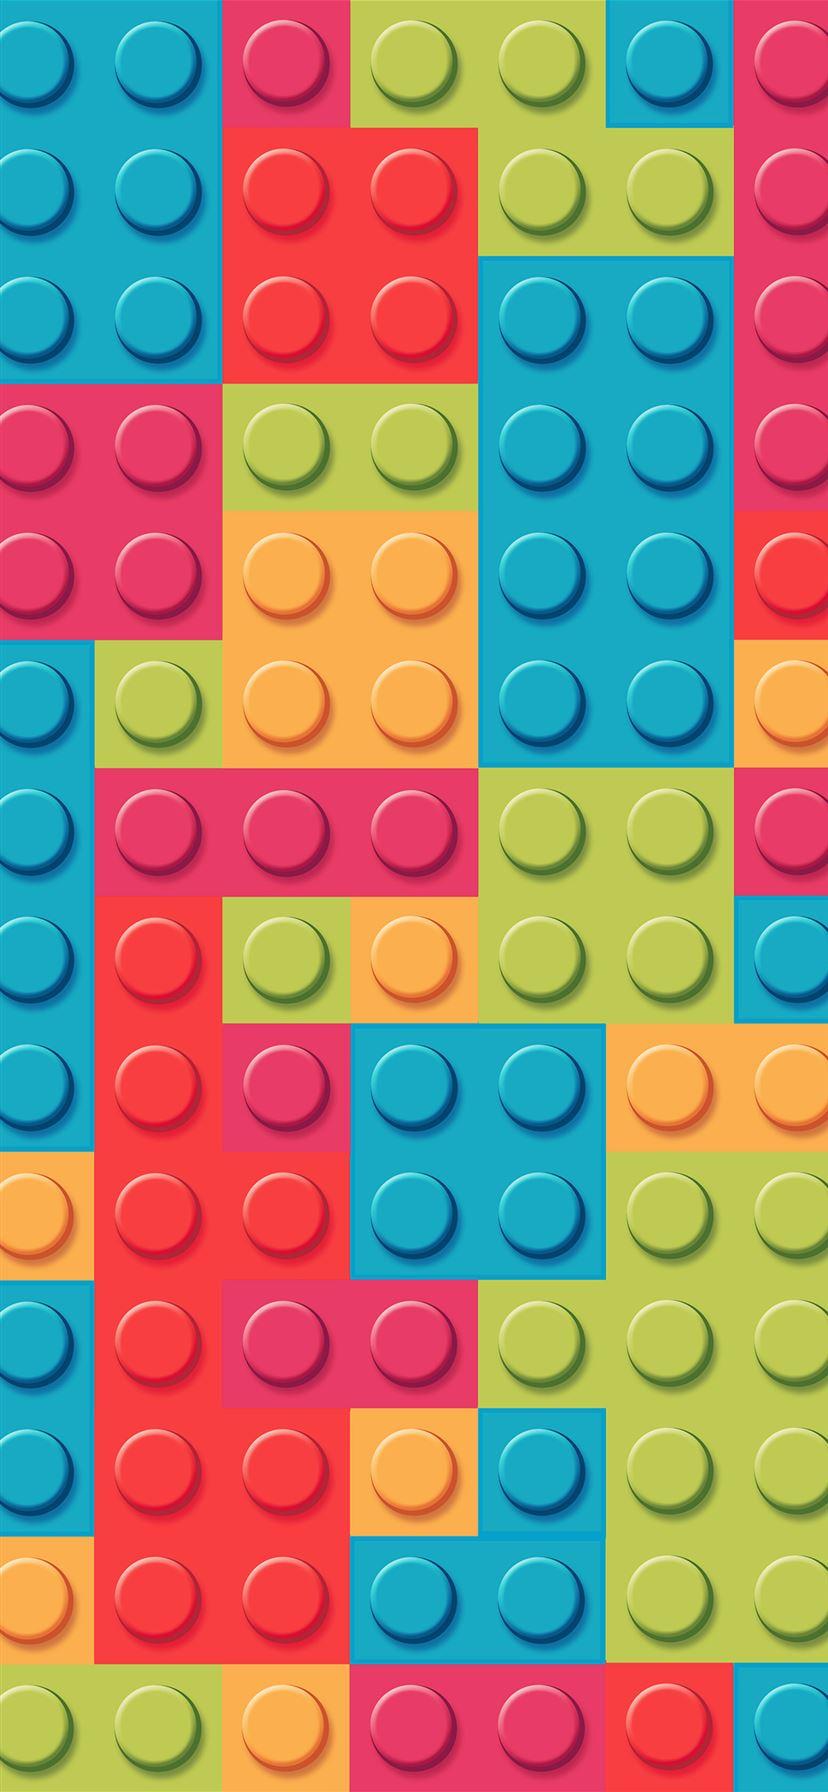 Blocks Rainbow Lego Art Pattern Pastel Iphone 11 Wallpapers Free Download